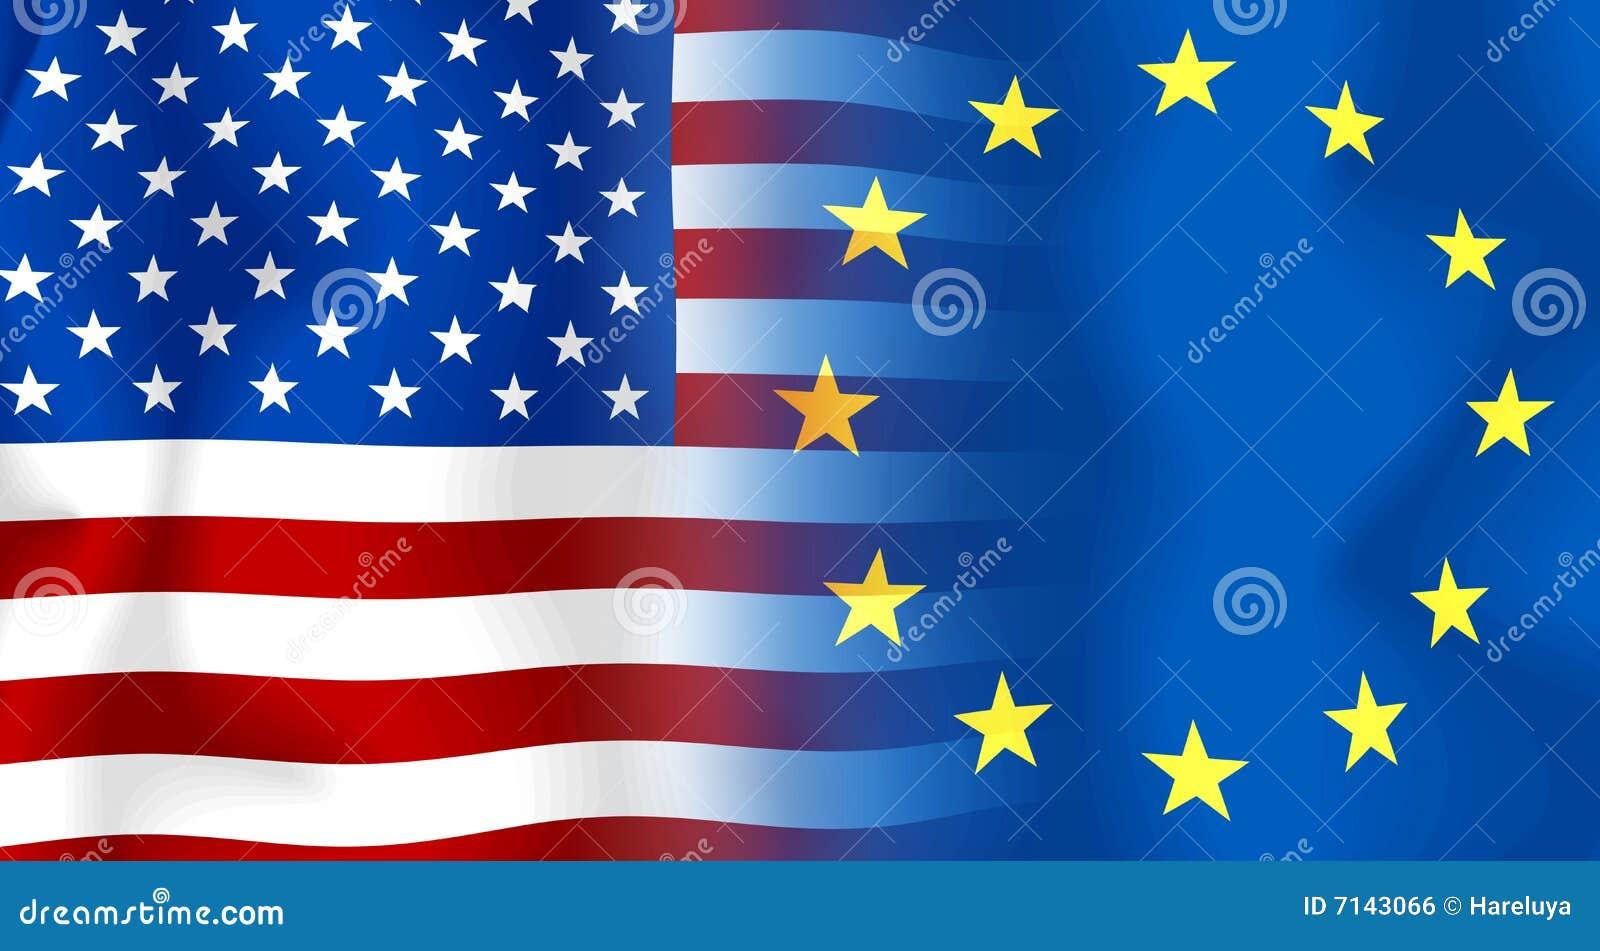 usaeu flag stock illustration image of color american